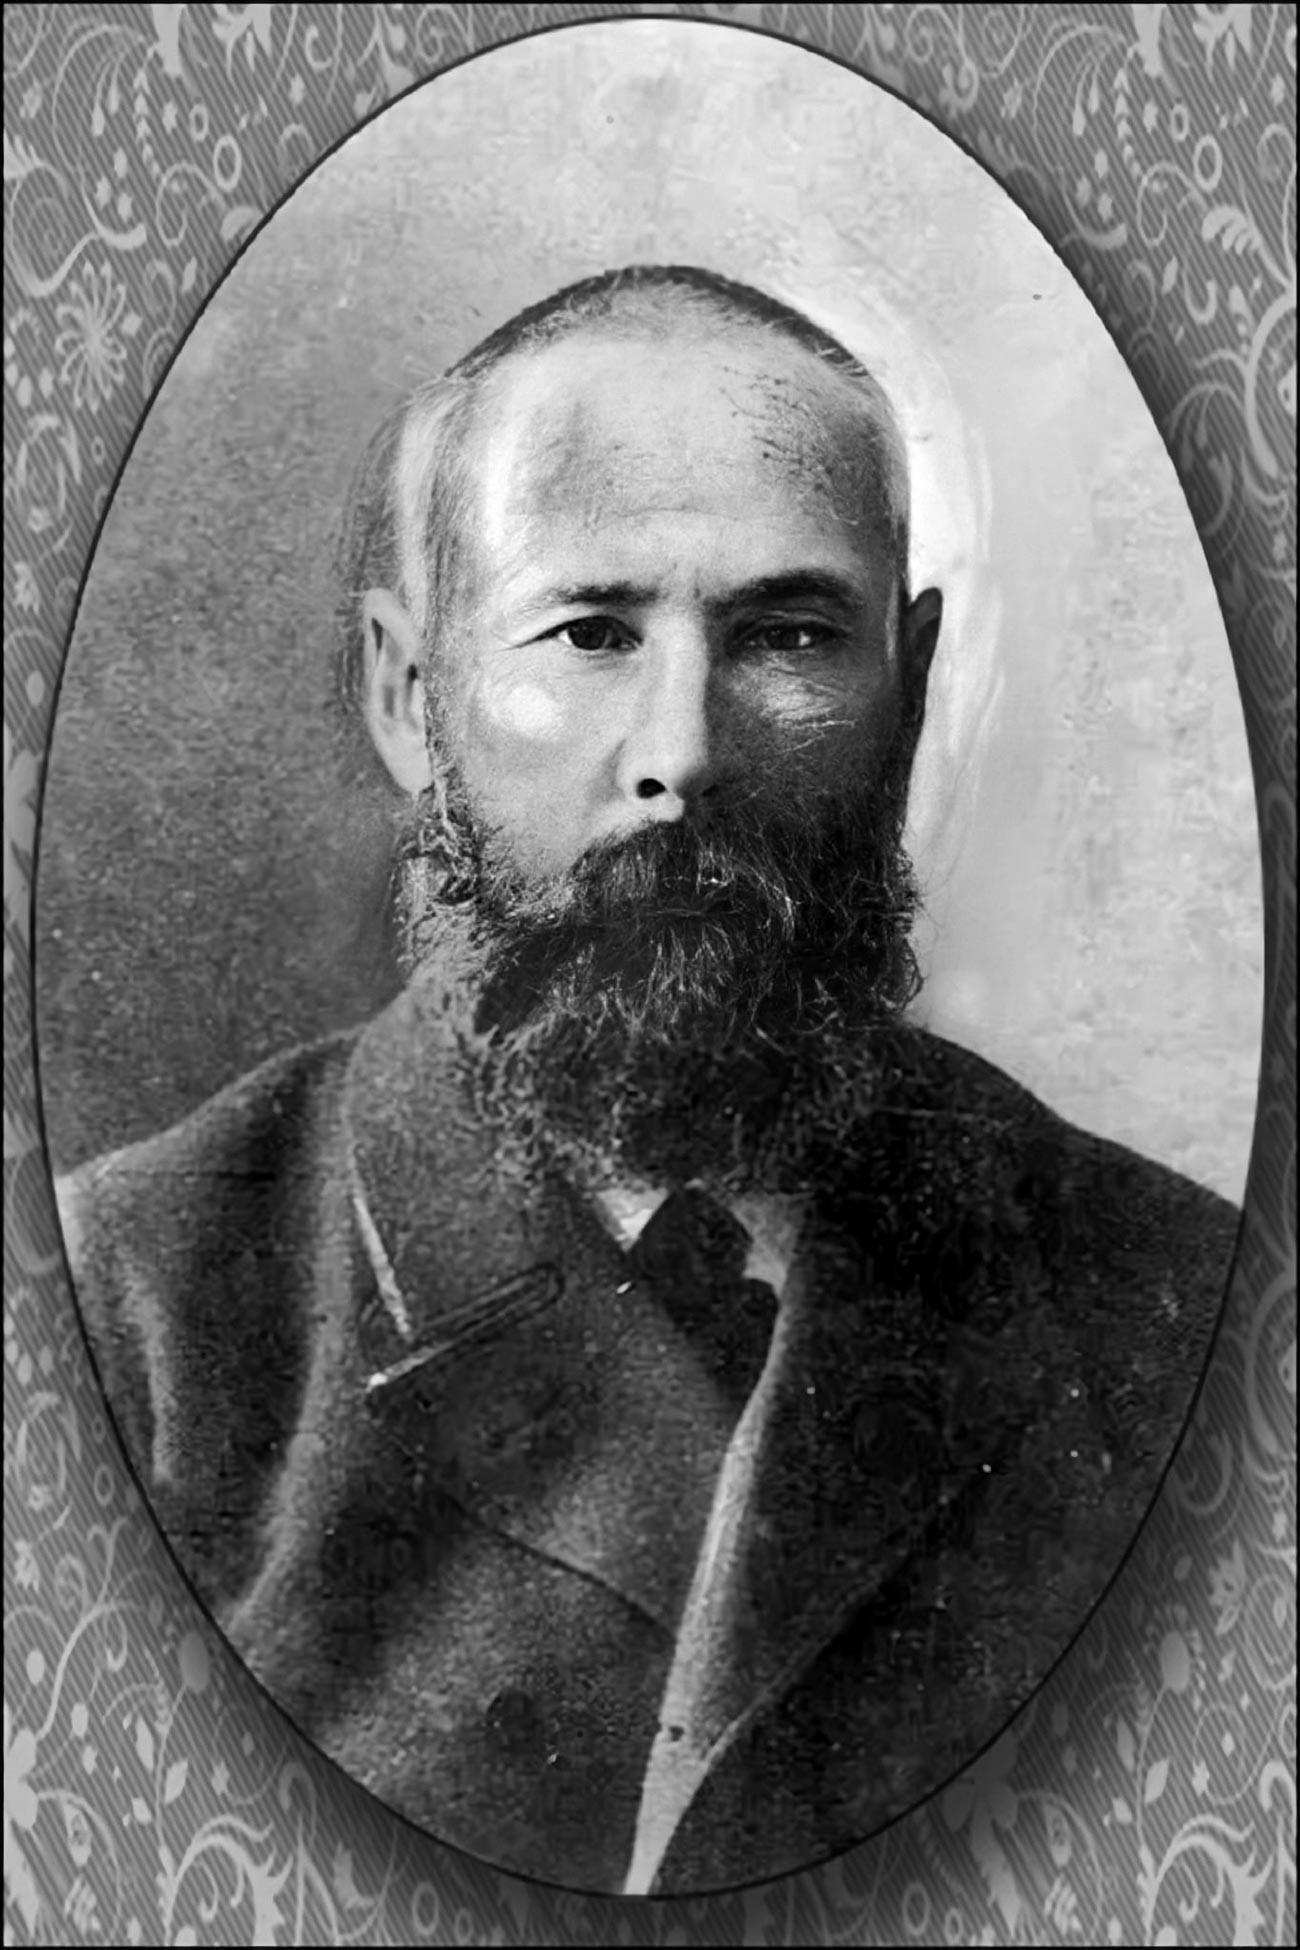 Mijaíl Yankovski